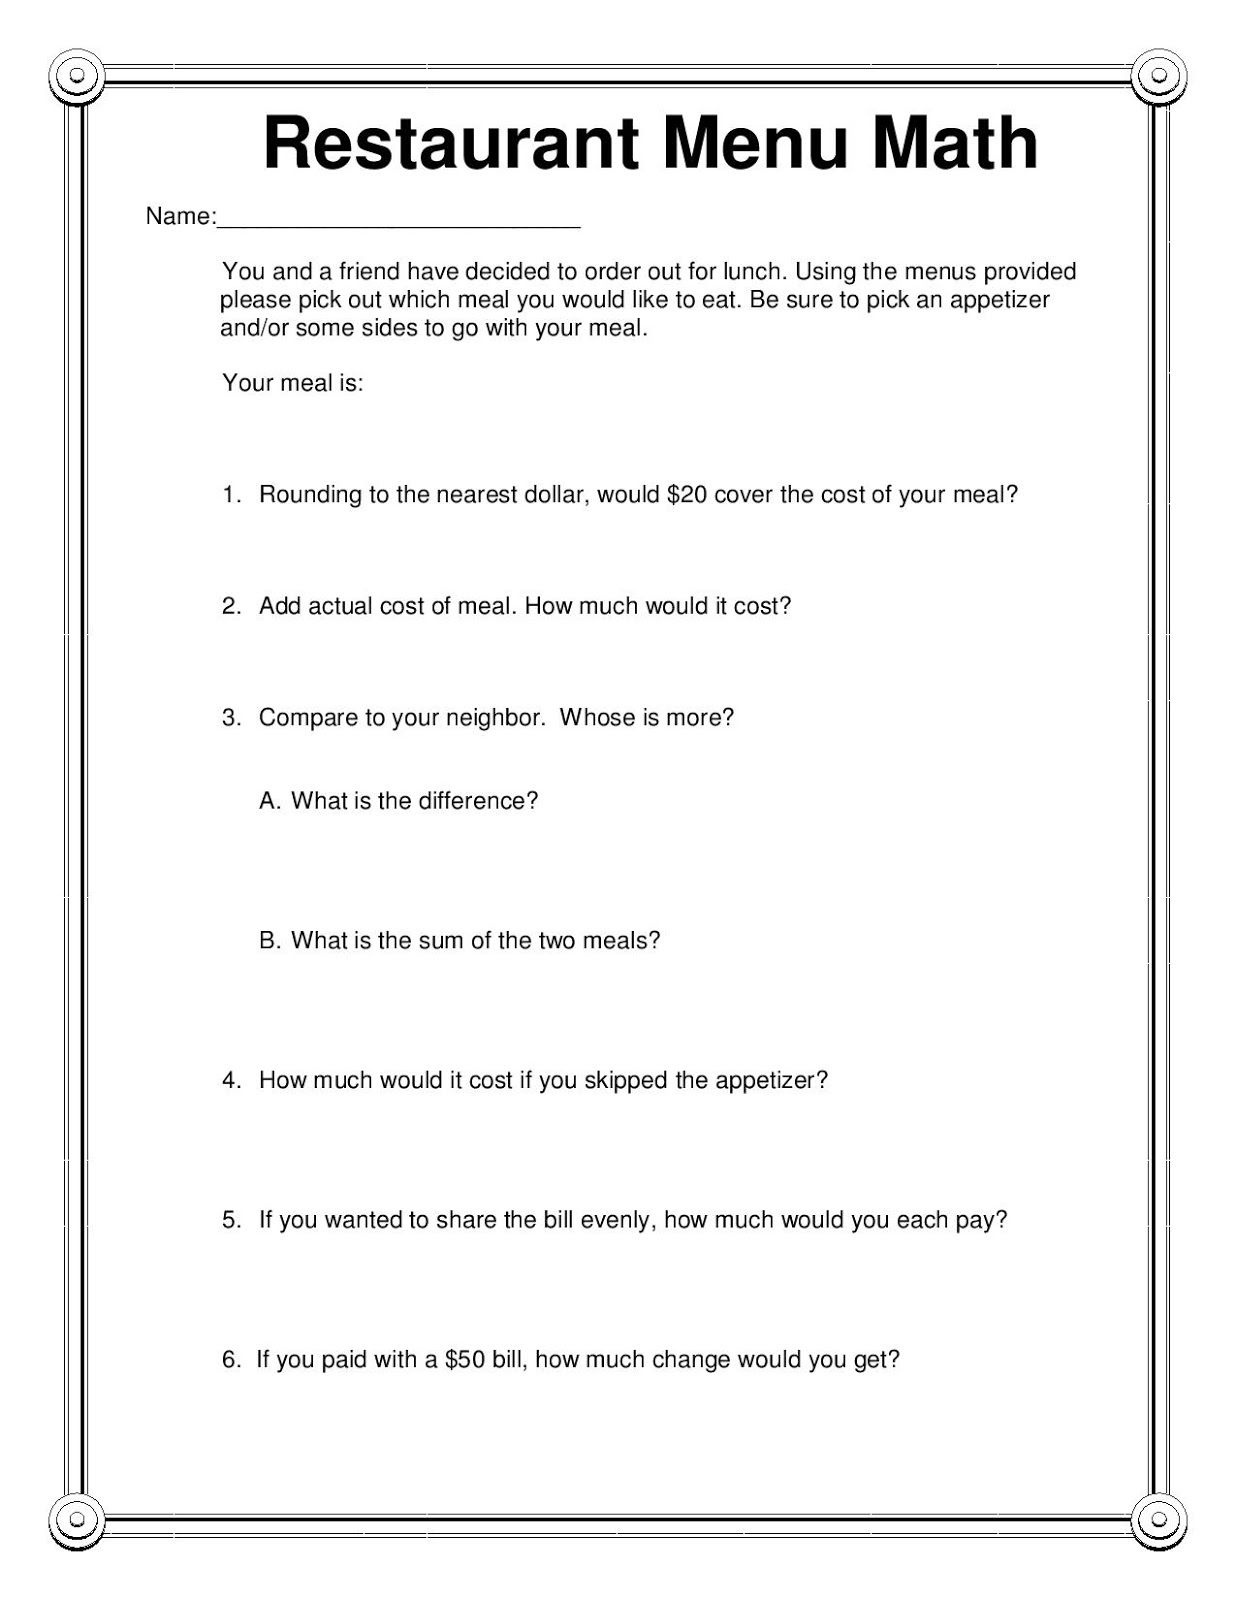 Restaurant Menu Math Freebie   Things For My Classroom   Elementary - Free Printable Menu Math Worksheets